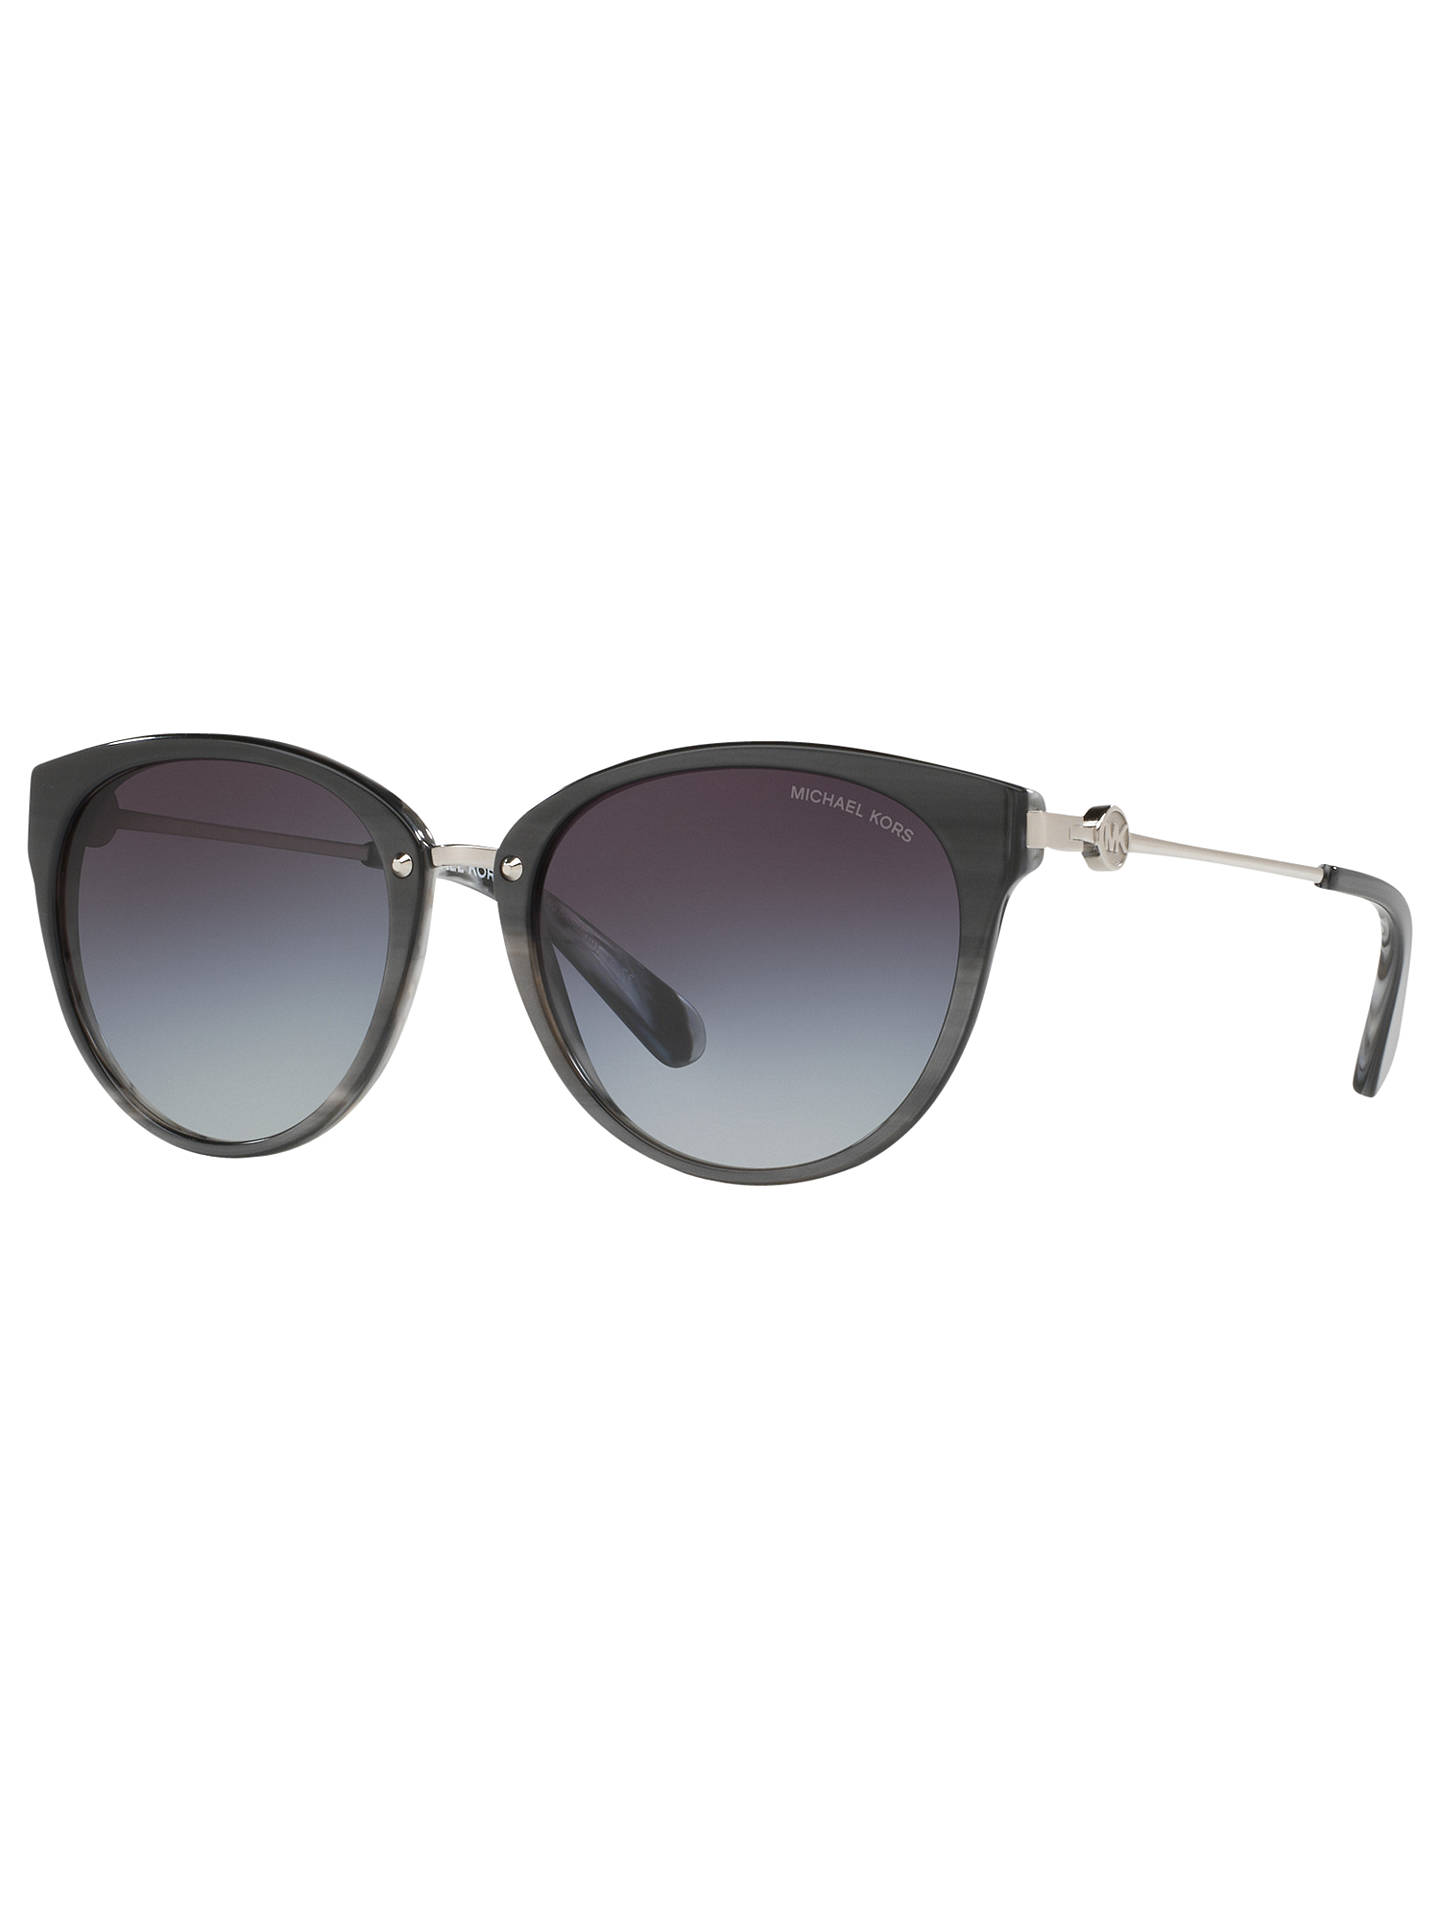 02d56132a8 Buy Michael Kors MK6040 Abela III Round Sunglasses